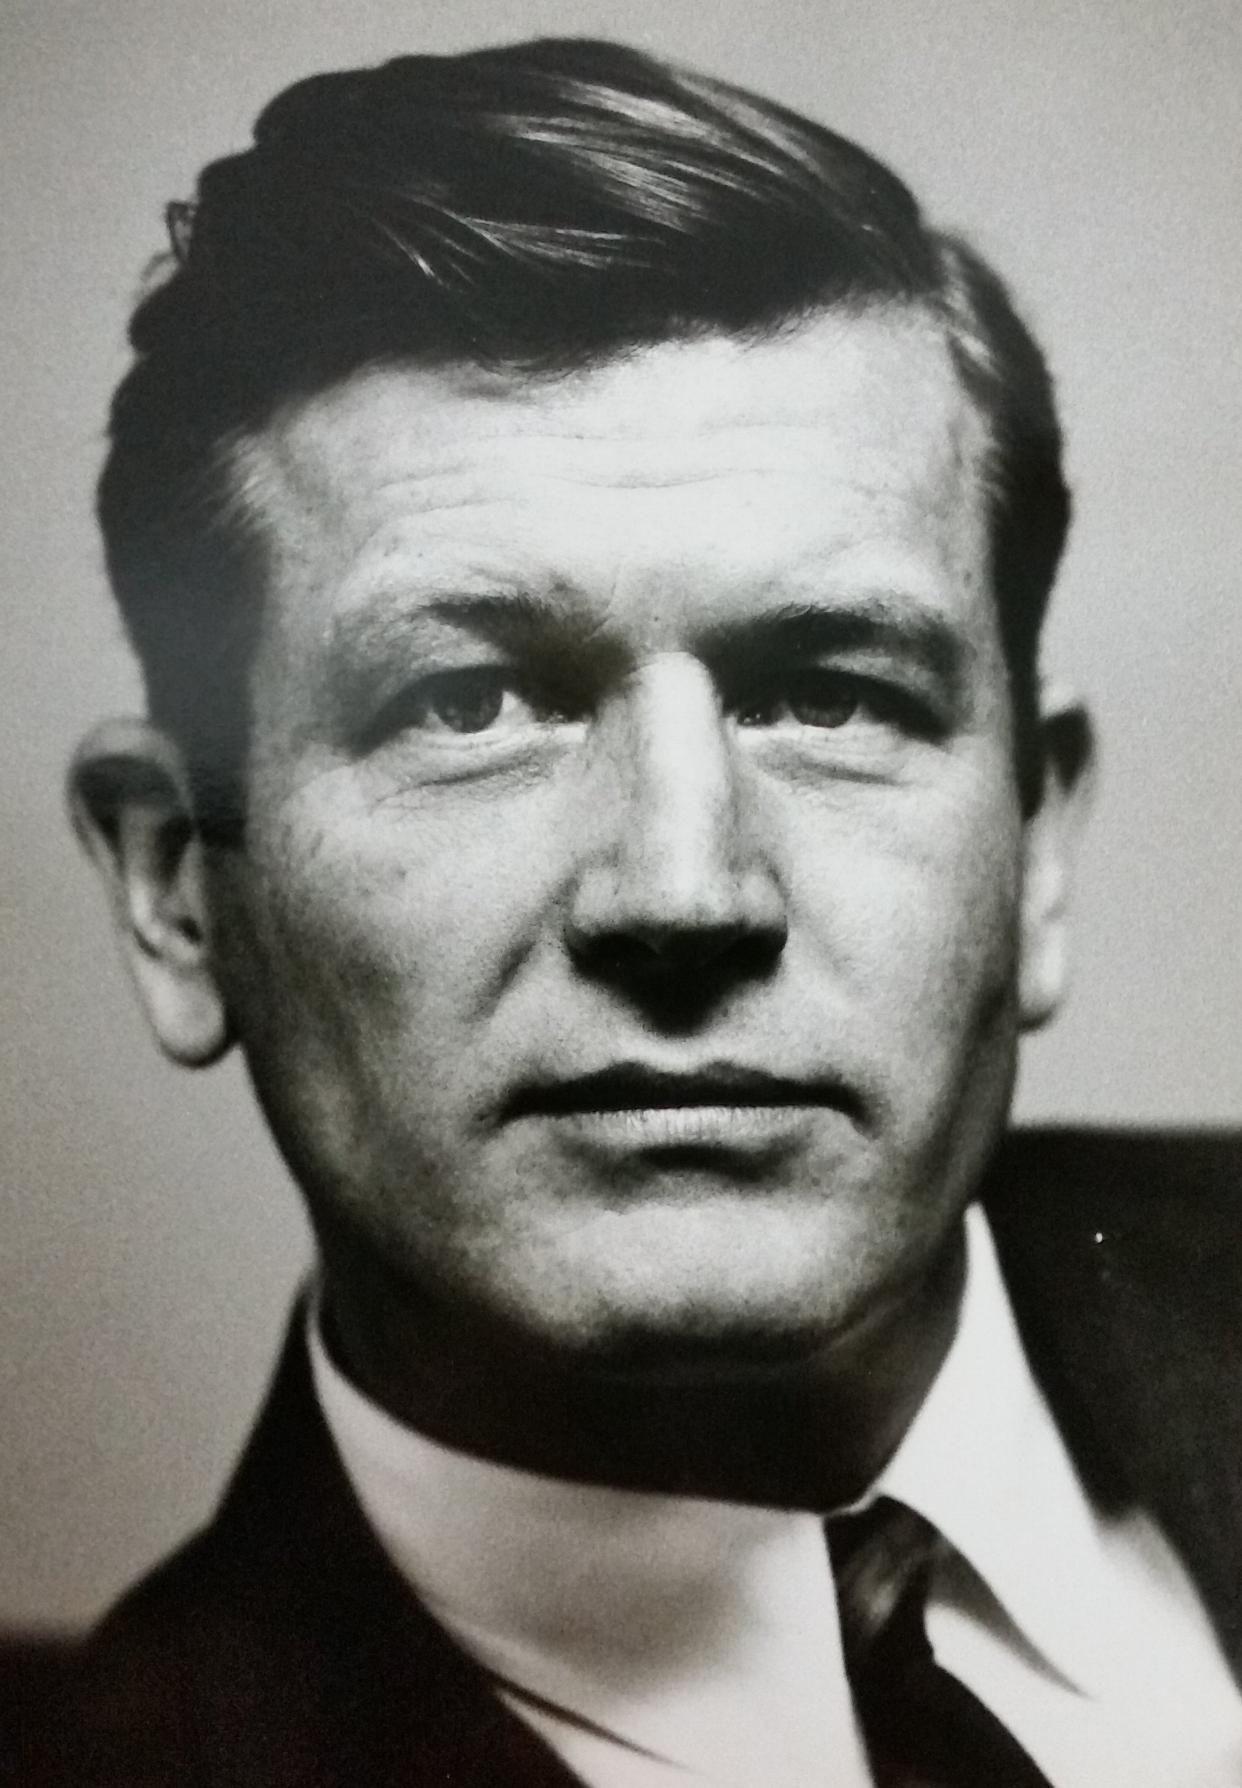 Mayor John Lindsay, New York, 1965